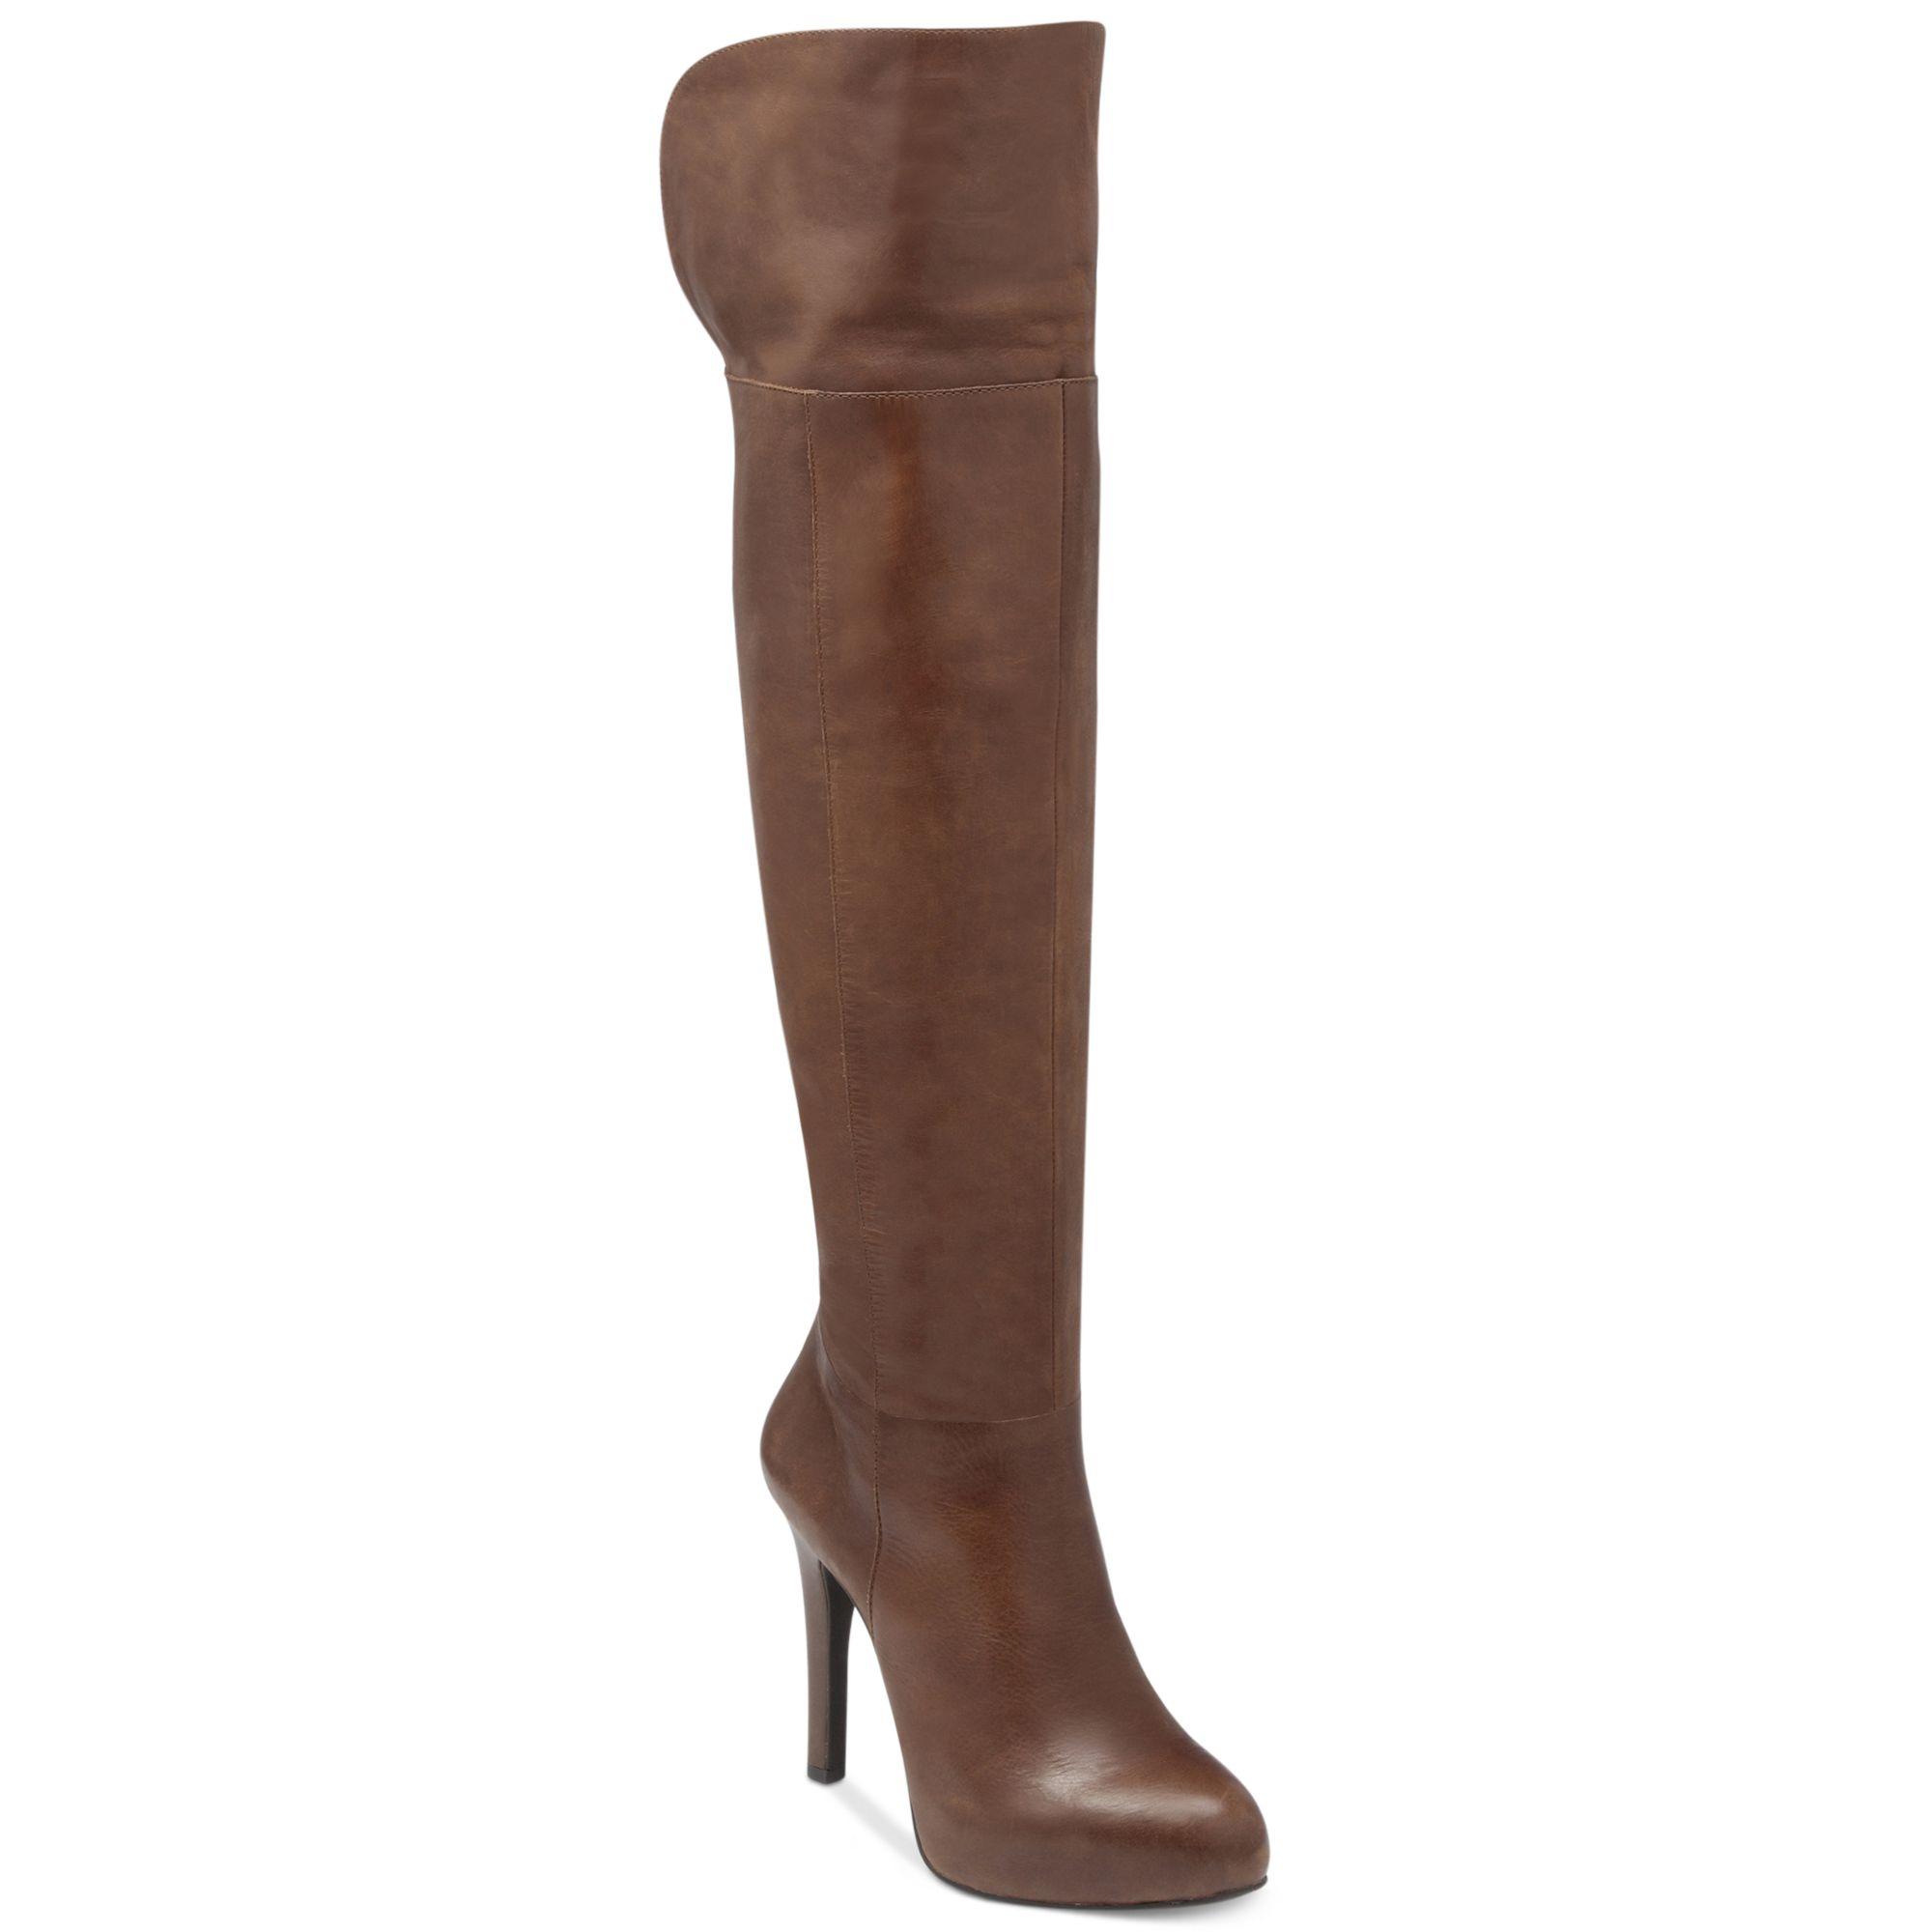 Jessica Simpson Audrey Overtheknee Platform Boots In Brown